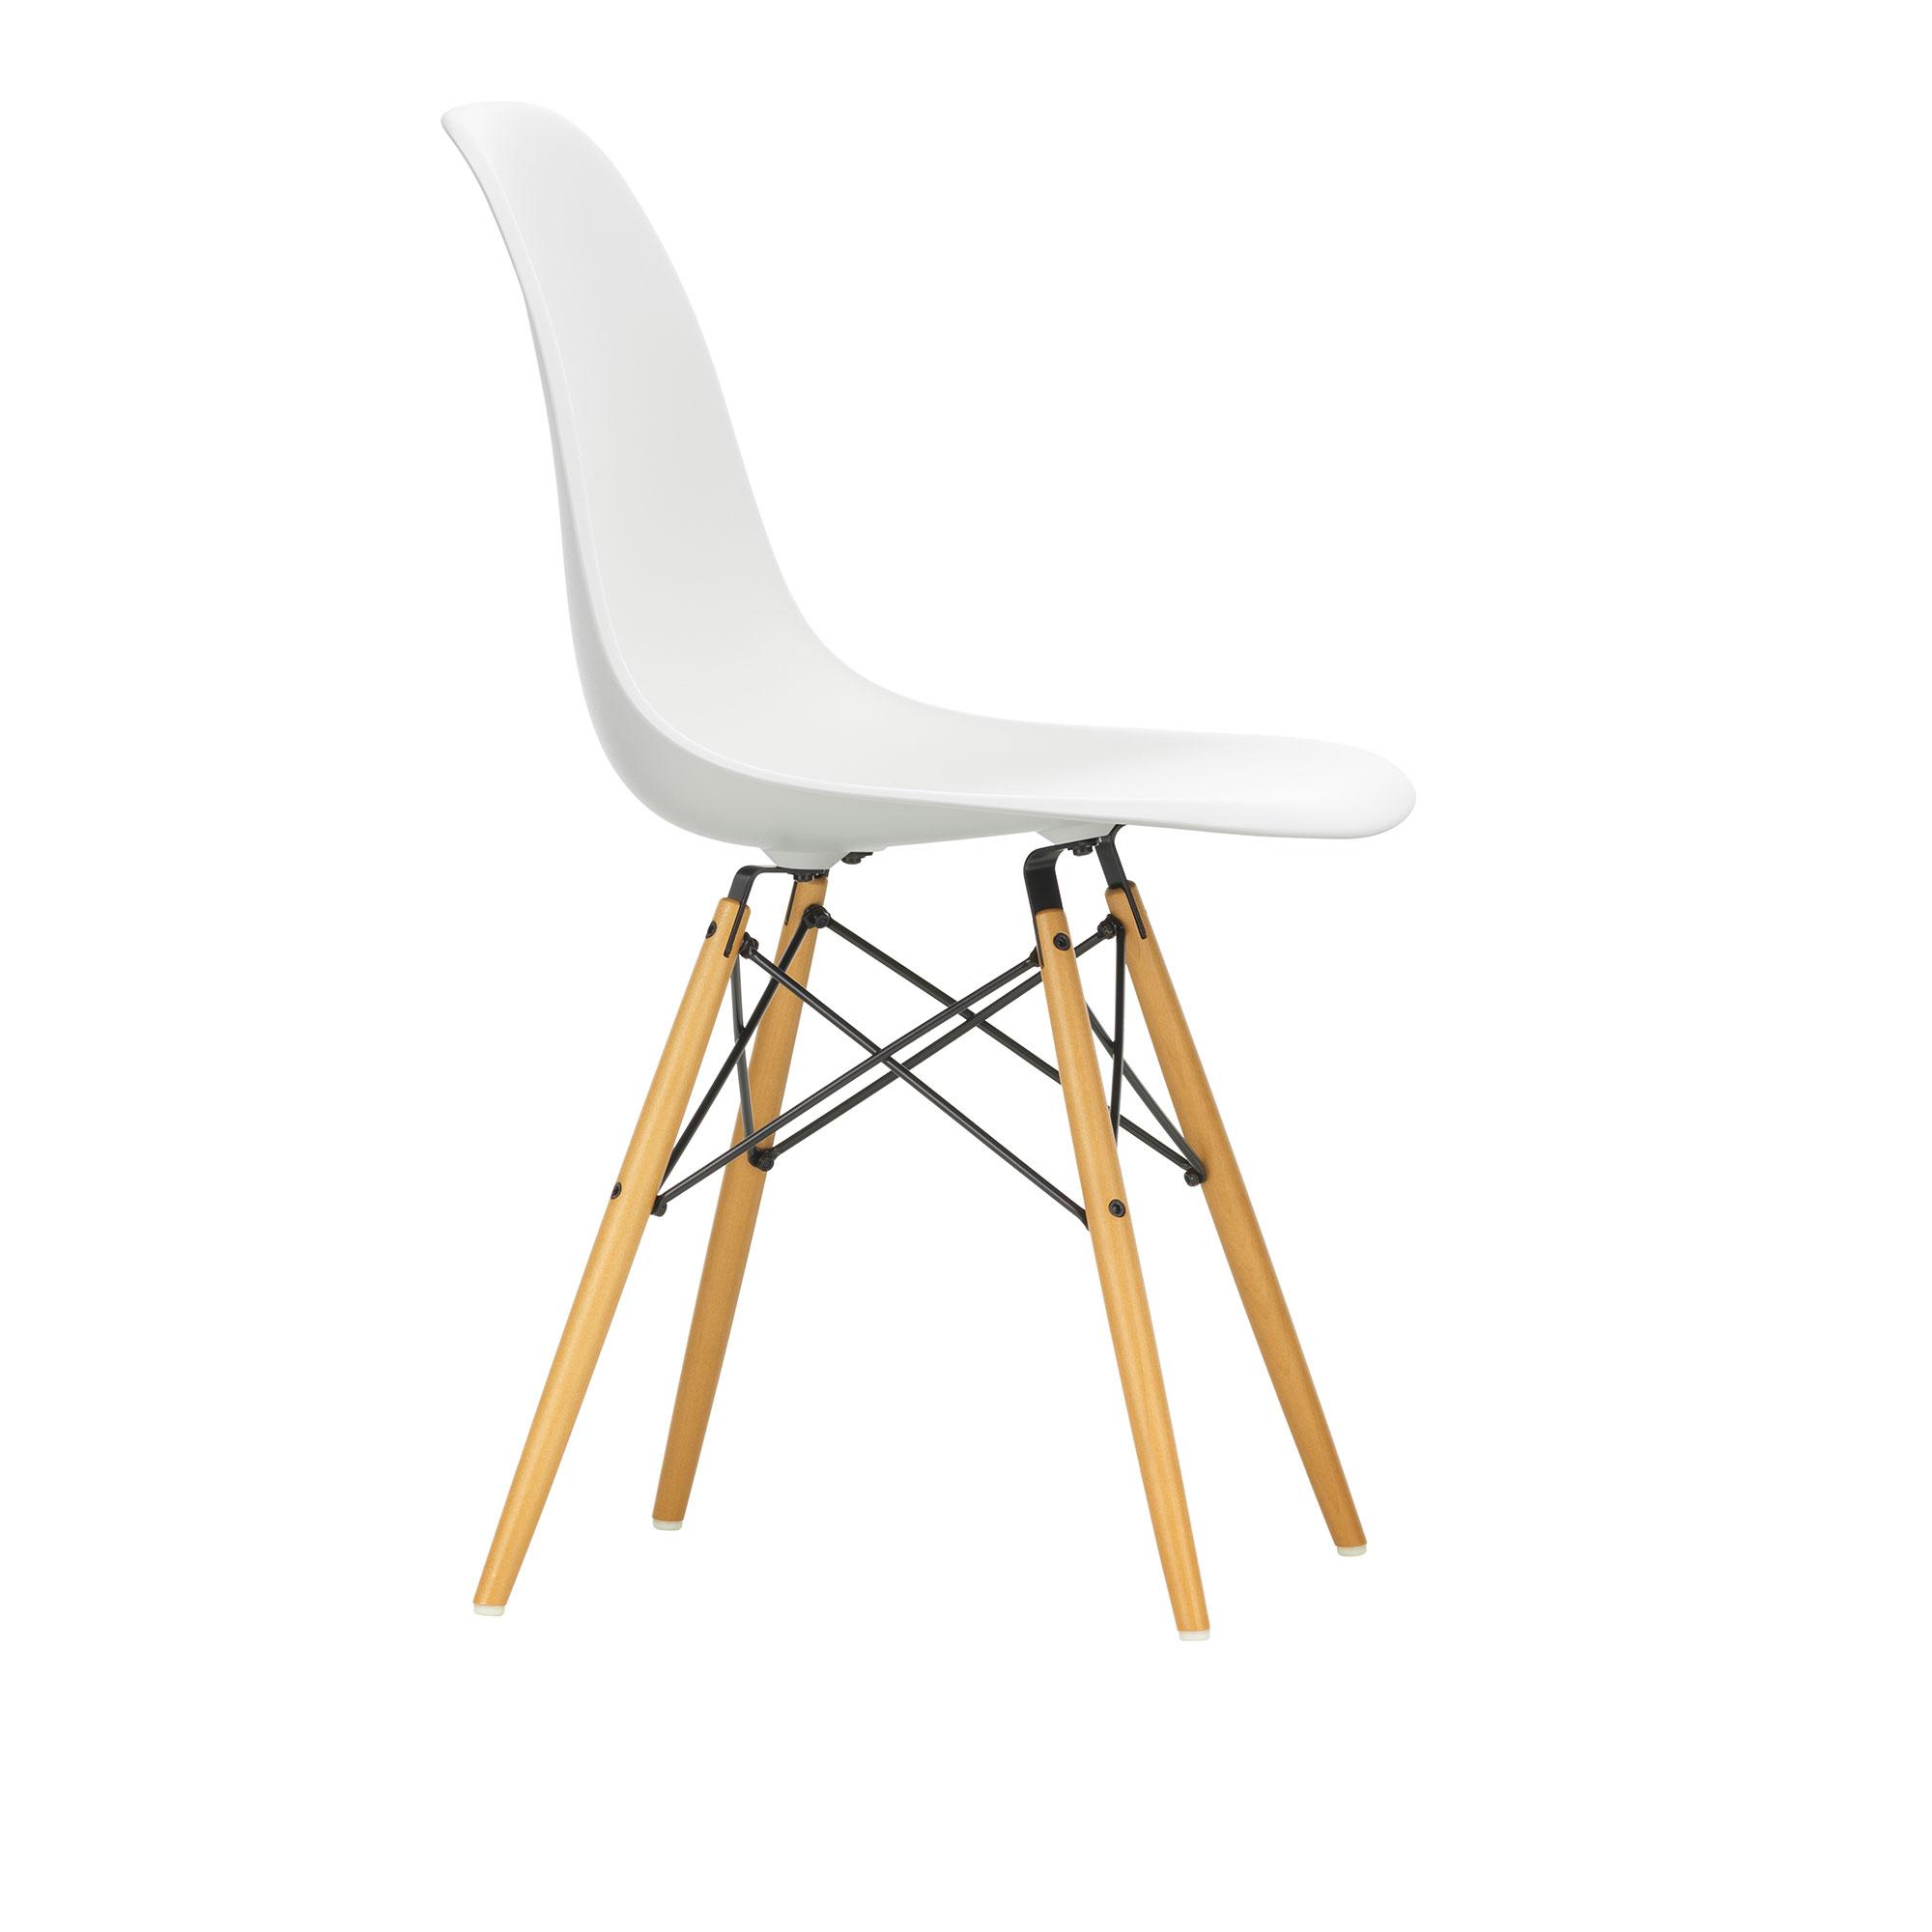 Eames Plastic Chair DSW 04 White Golden Maple